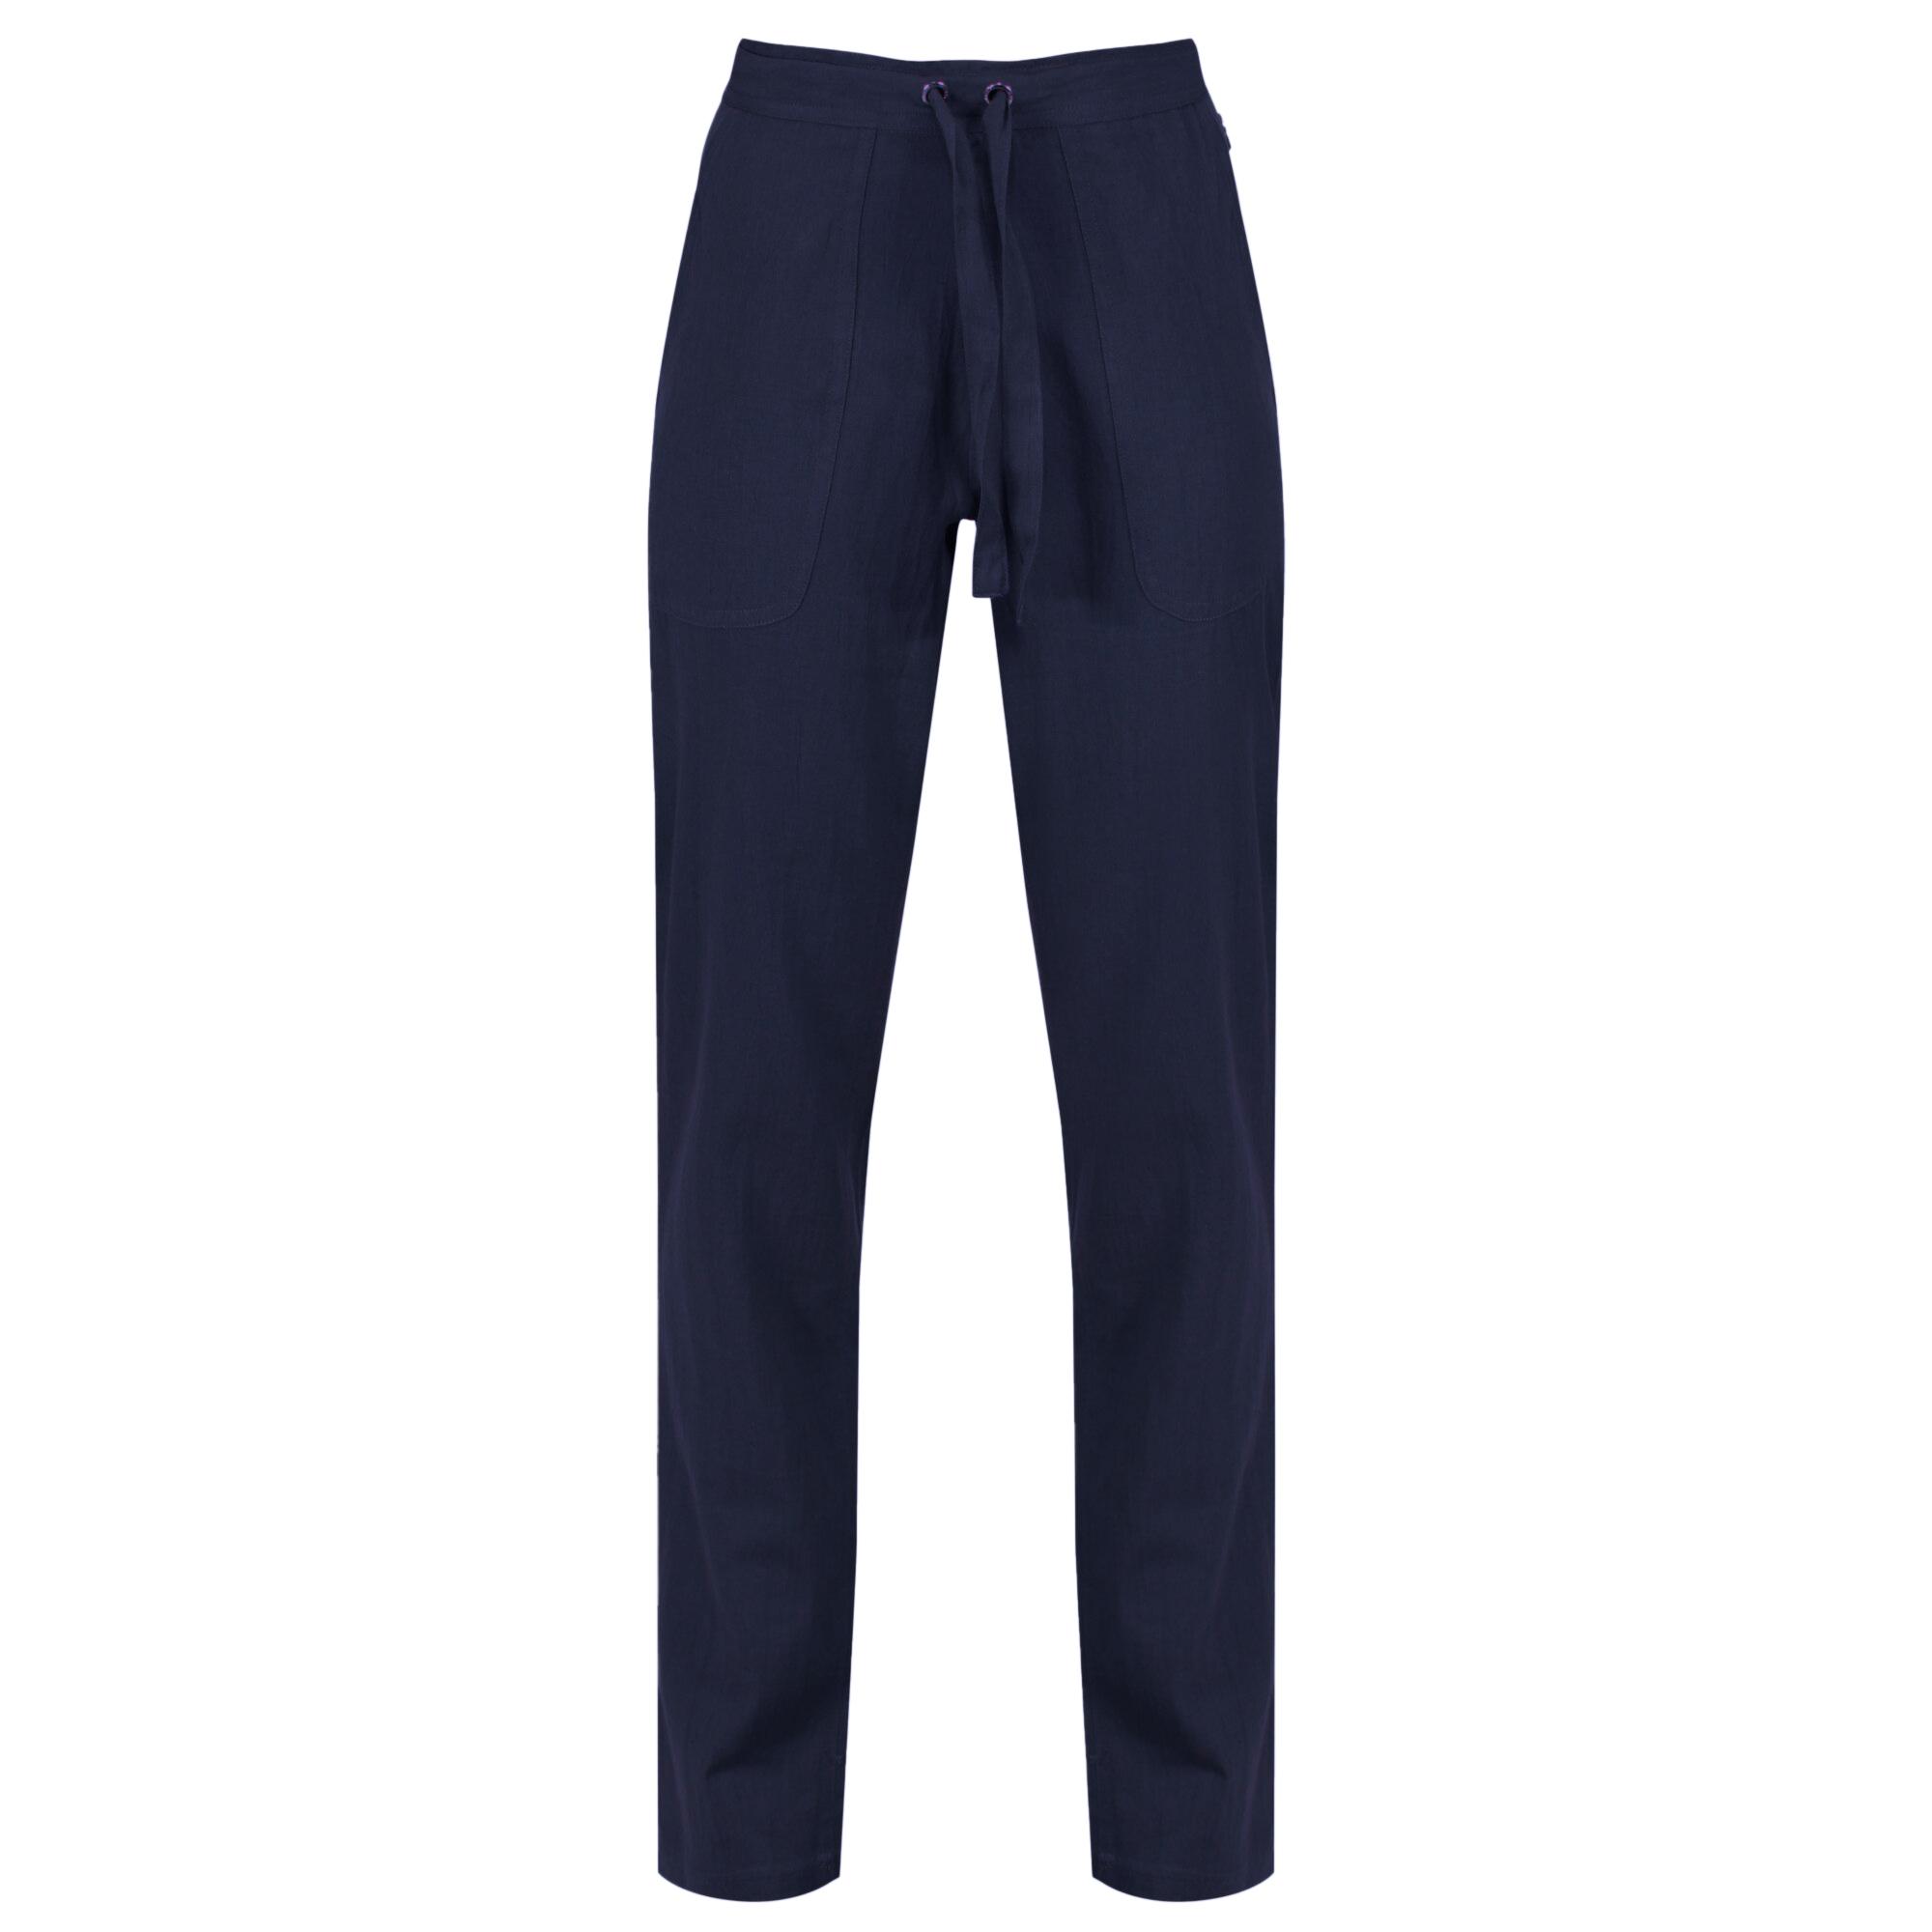 Regatta Womens/Ladies Quanda Coolweave Cotton Trousers (16 UK) (Navy)